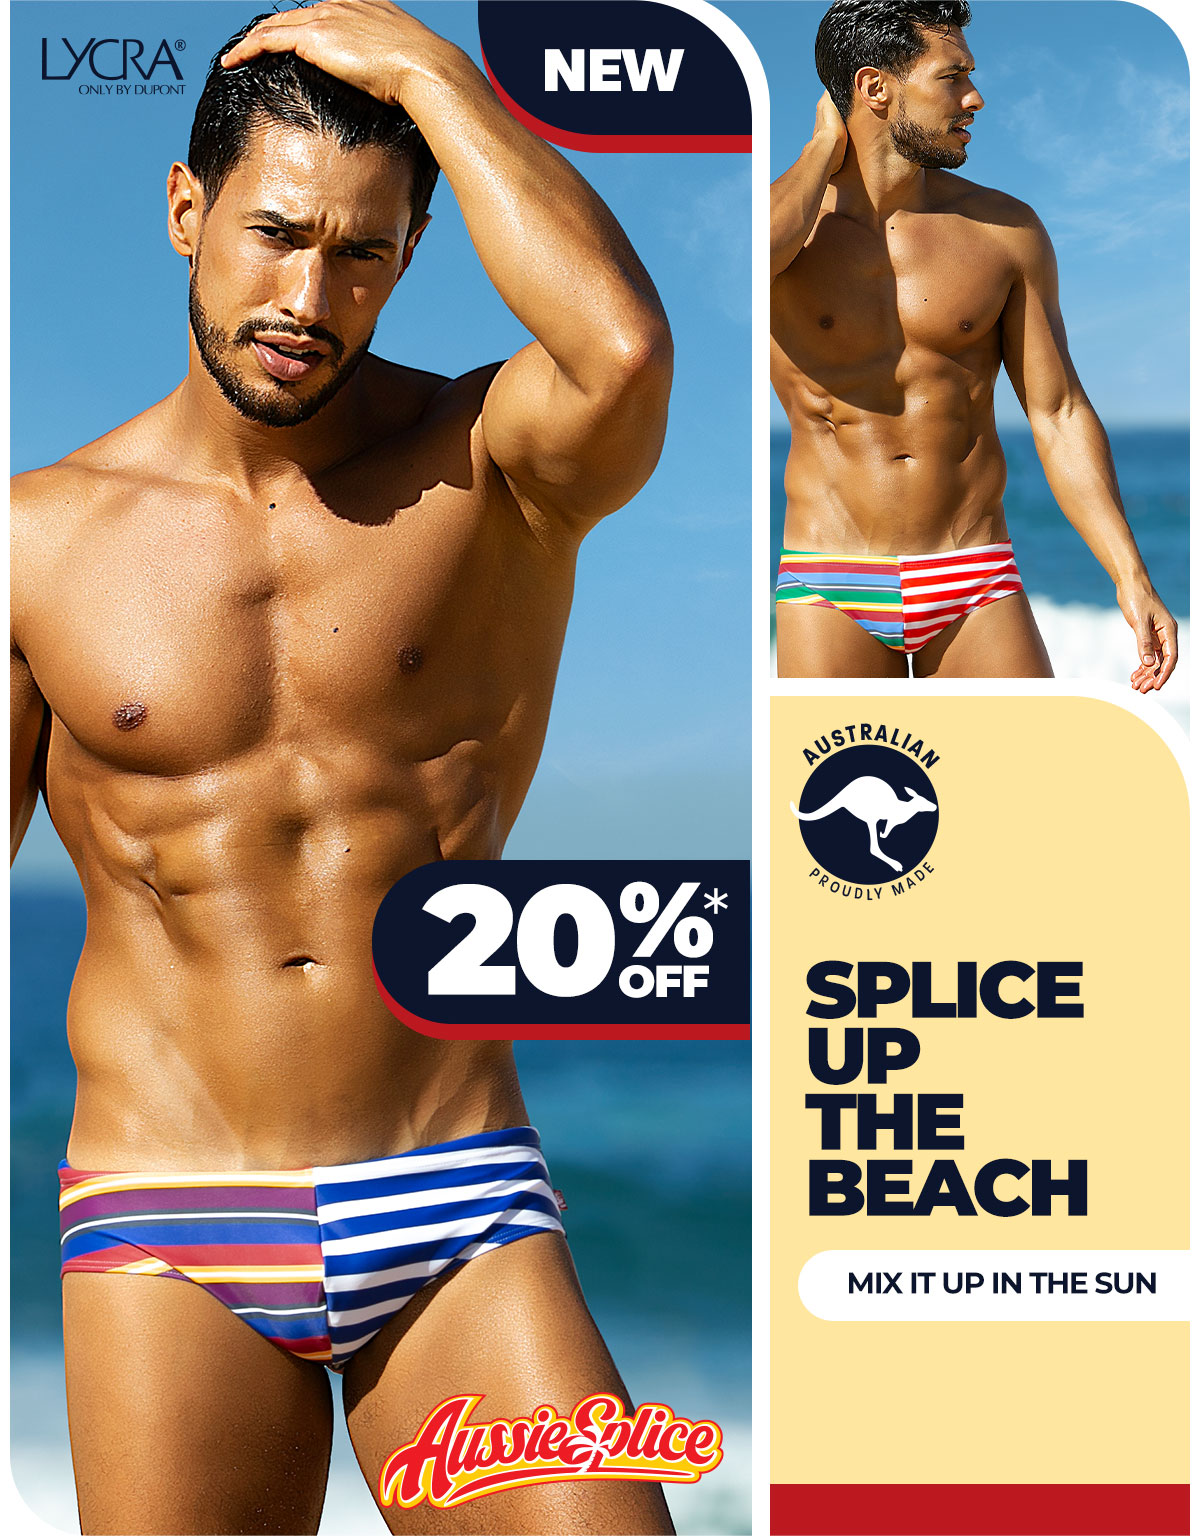 AussieSplice Blue Homepage Image